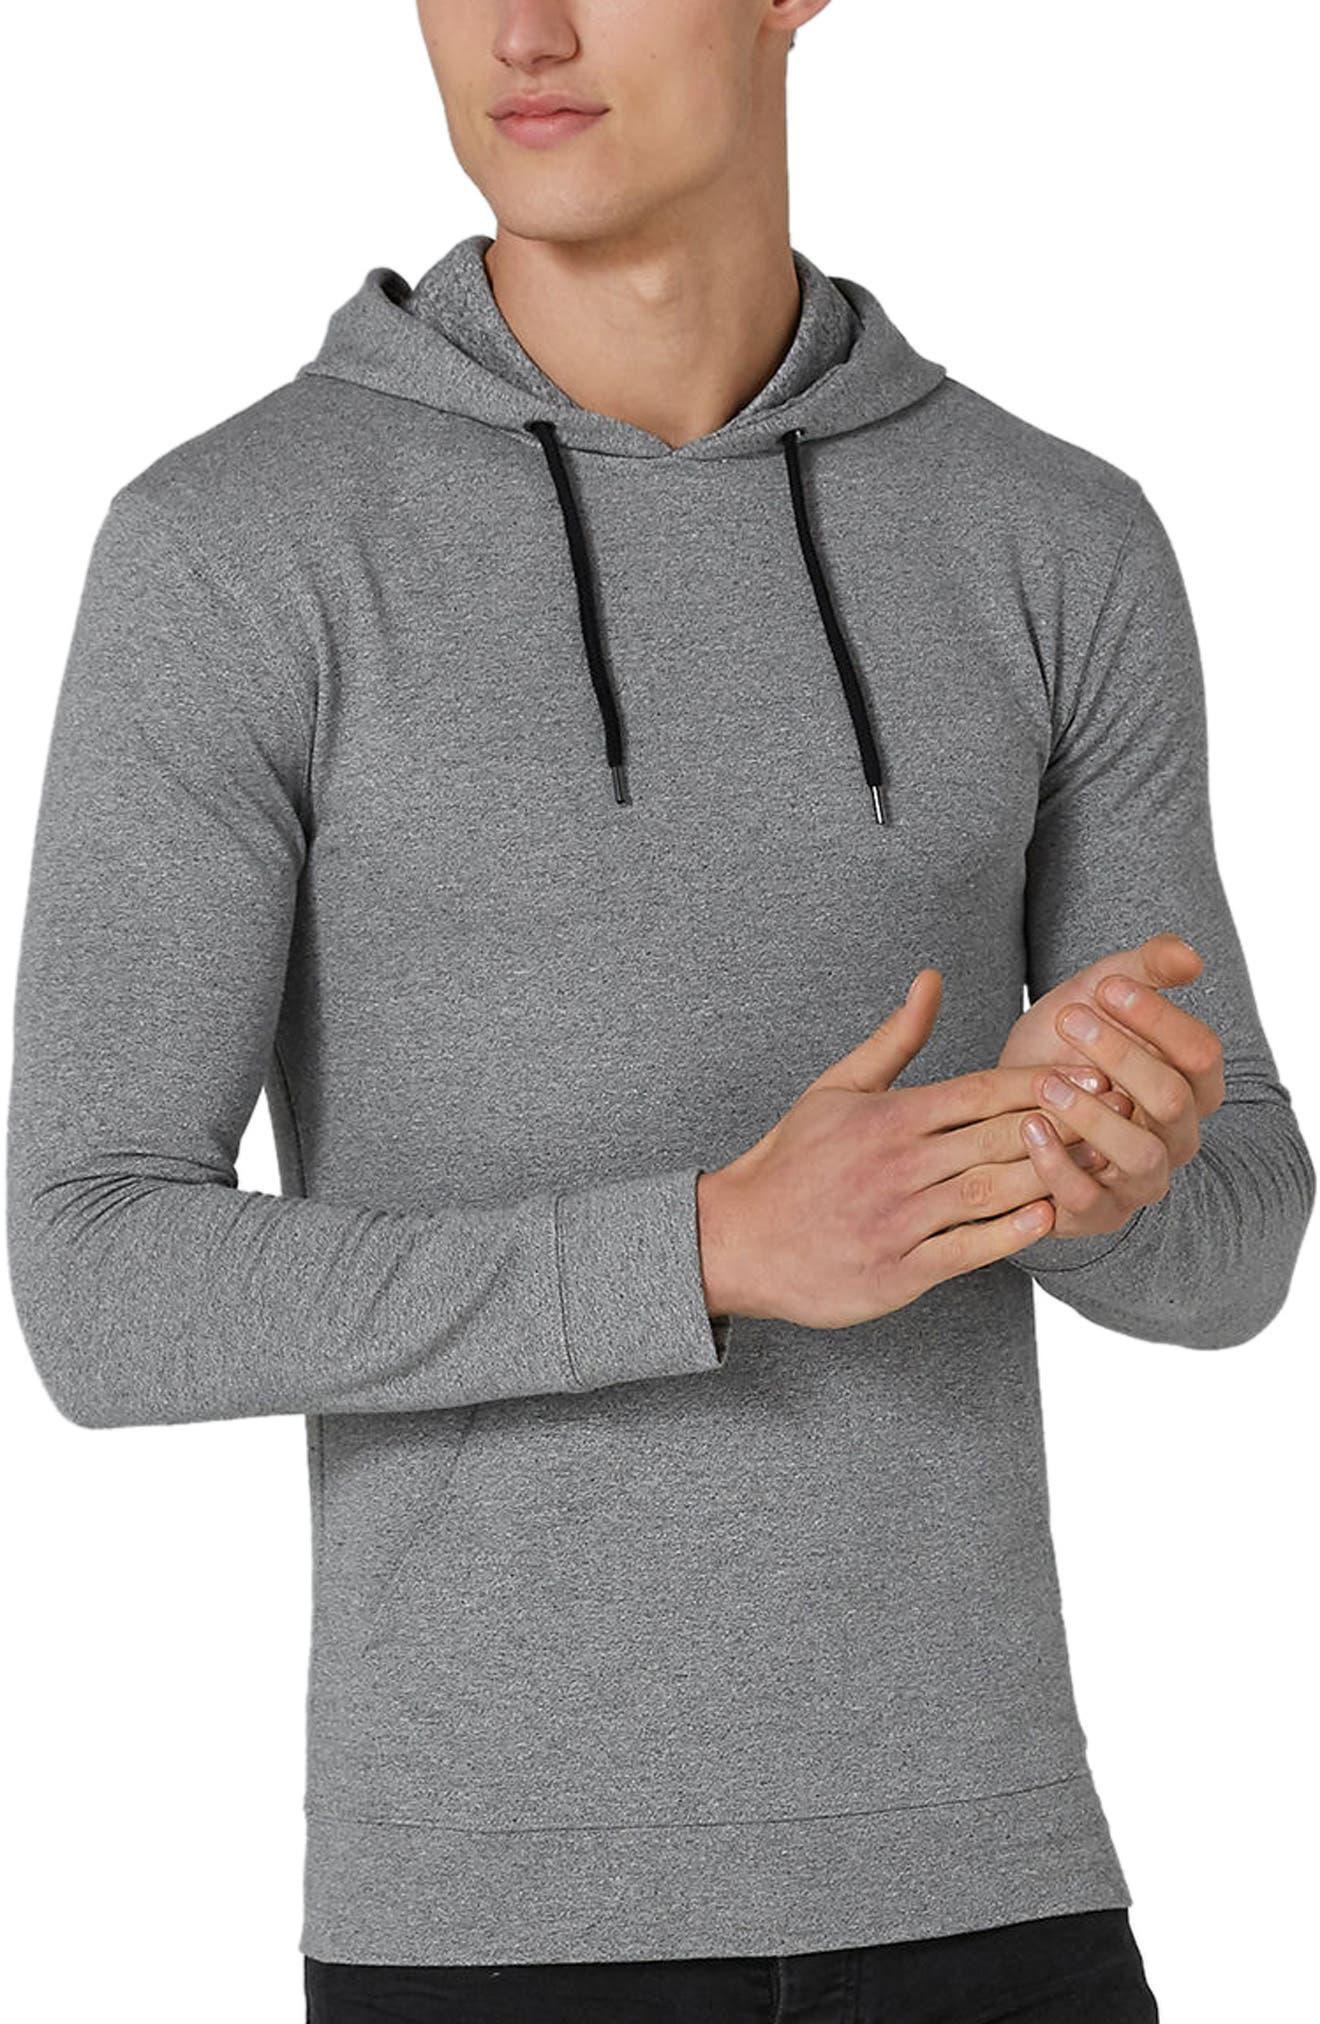 Muscle Fit Hoodie,                         Main,                         color, Grey